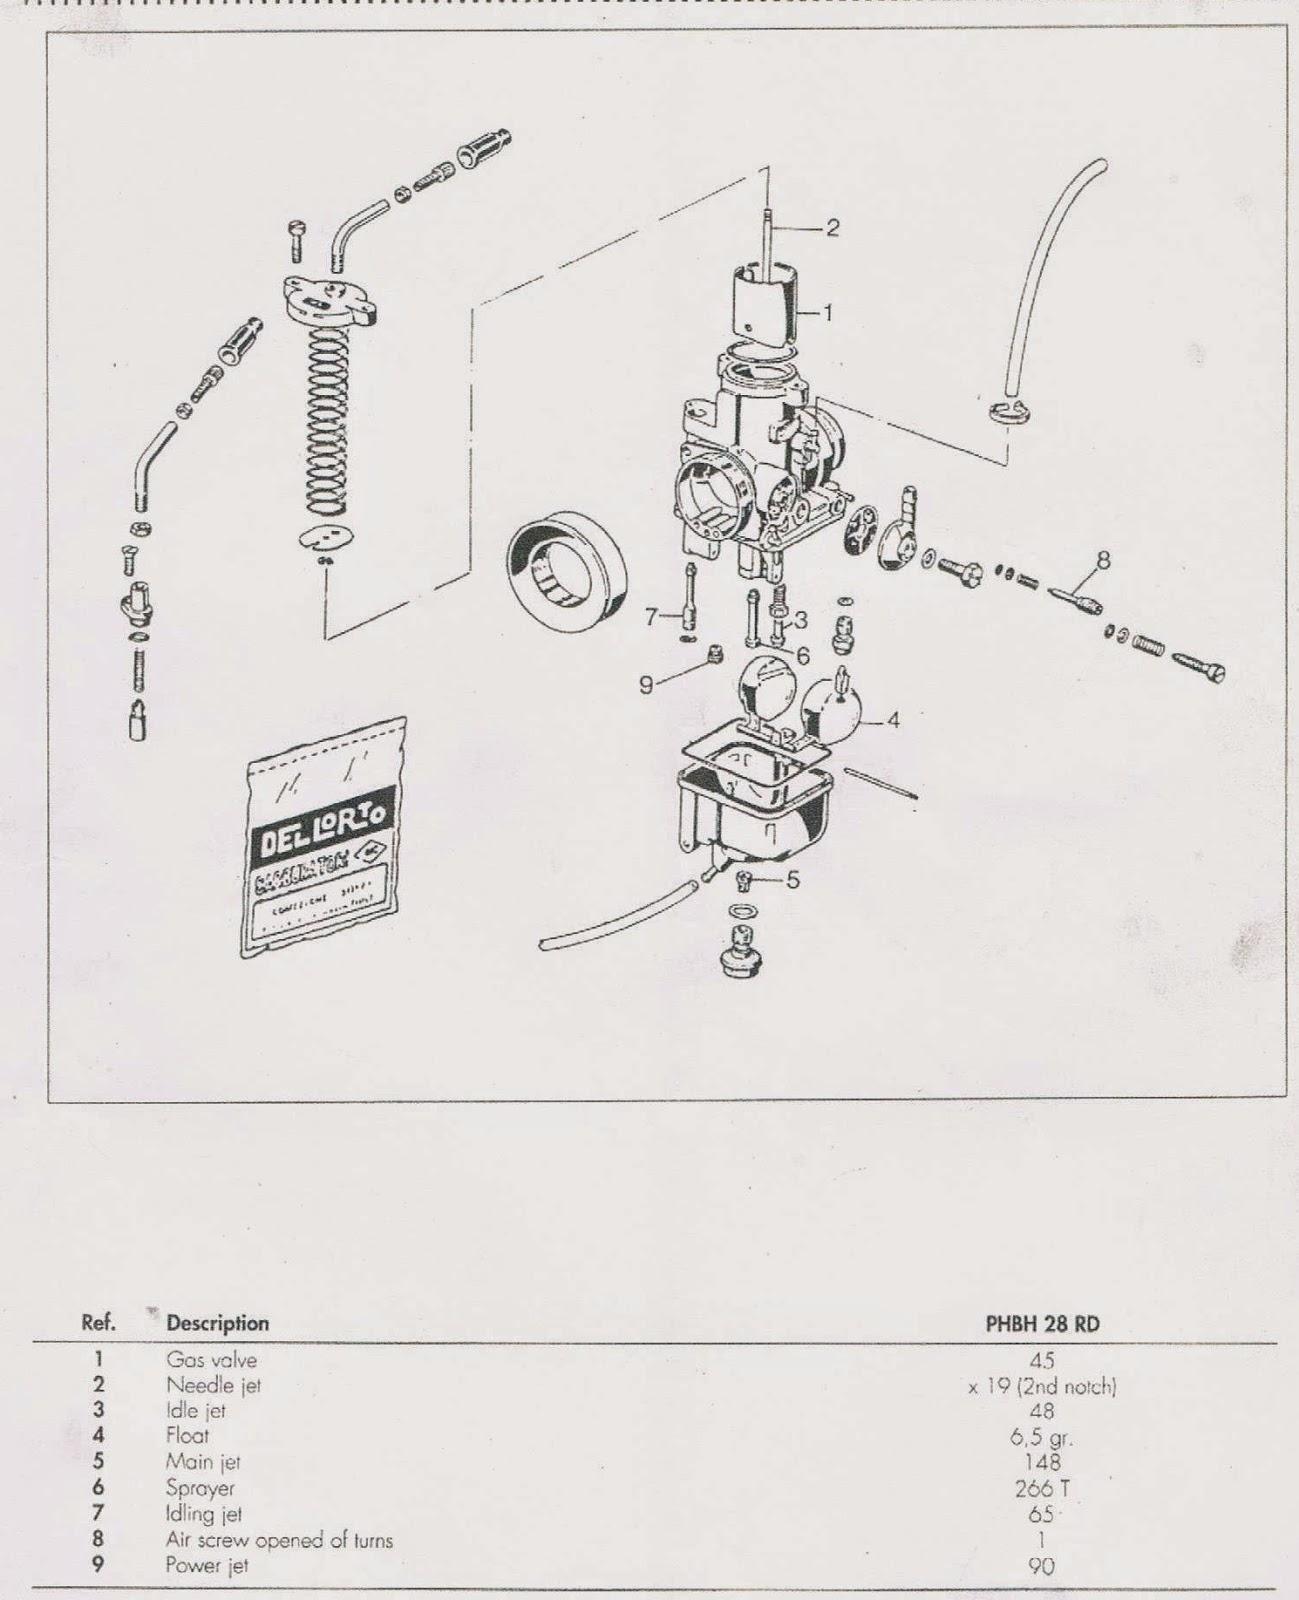 CAGIVA MITO 125 : cagiva mito 125 carb set up , how do you